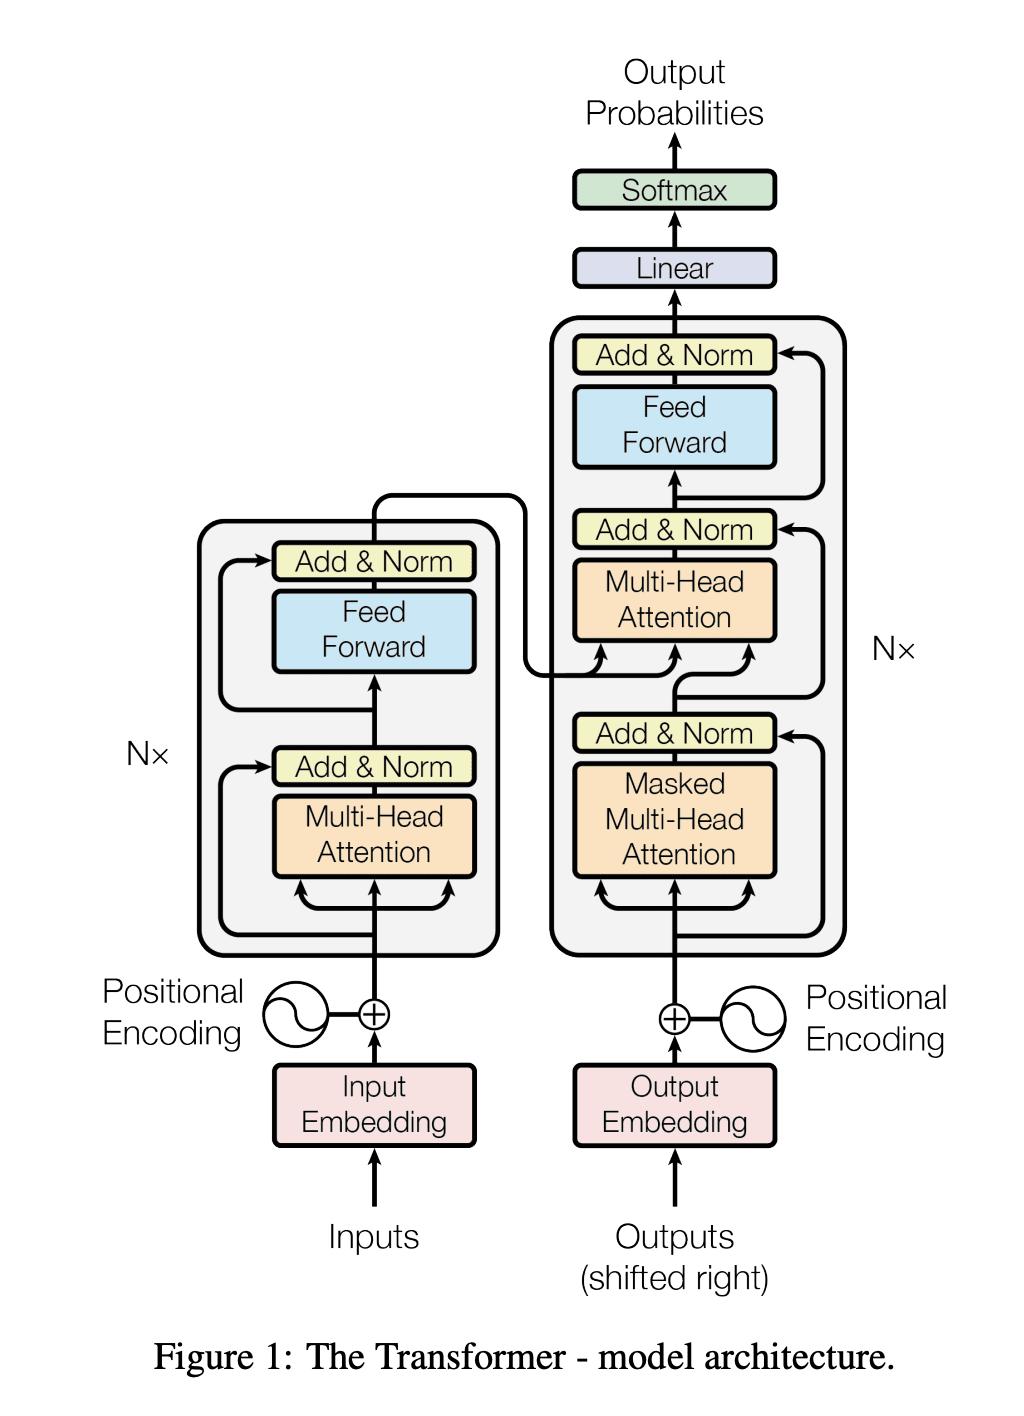 Transformer diagram from the original paper